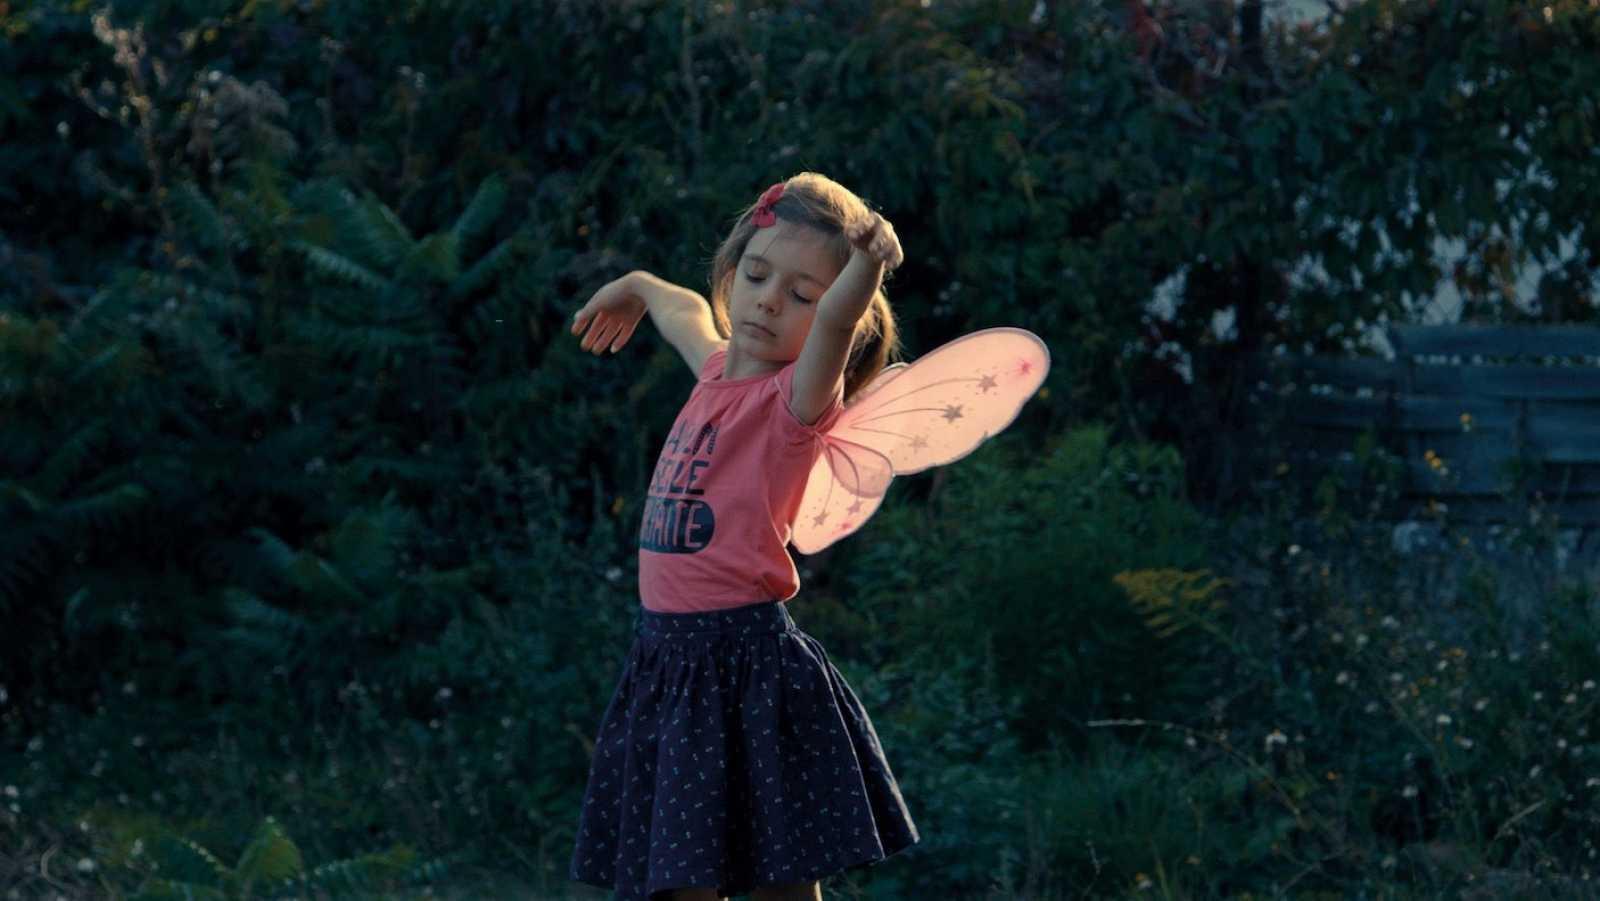 'Una niña'